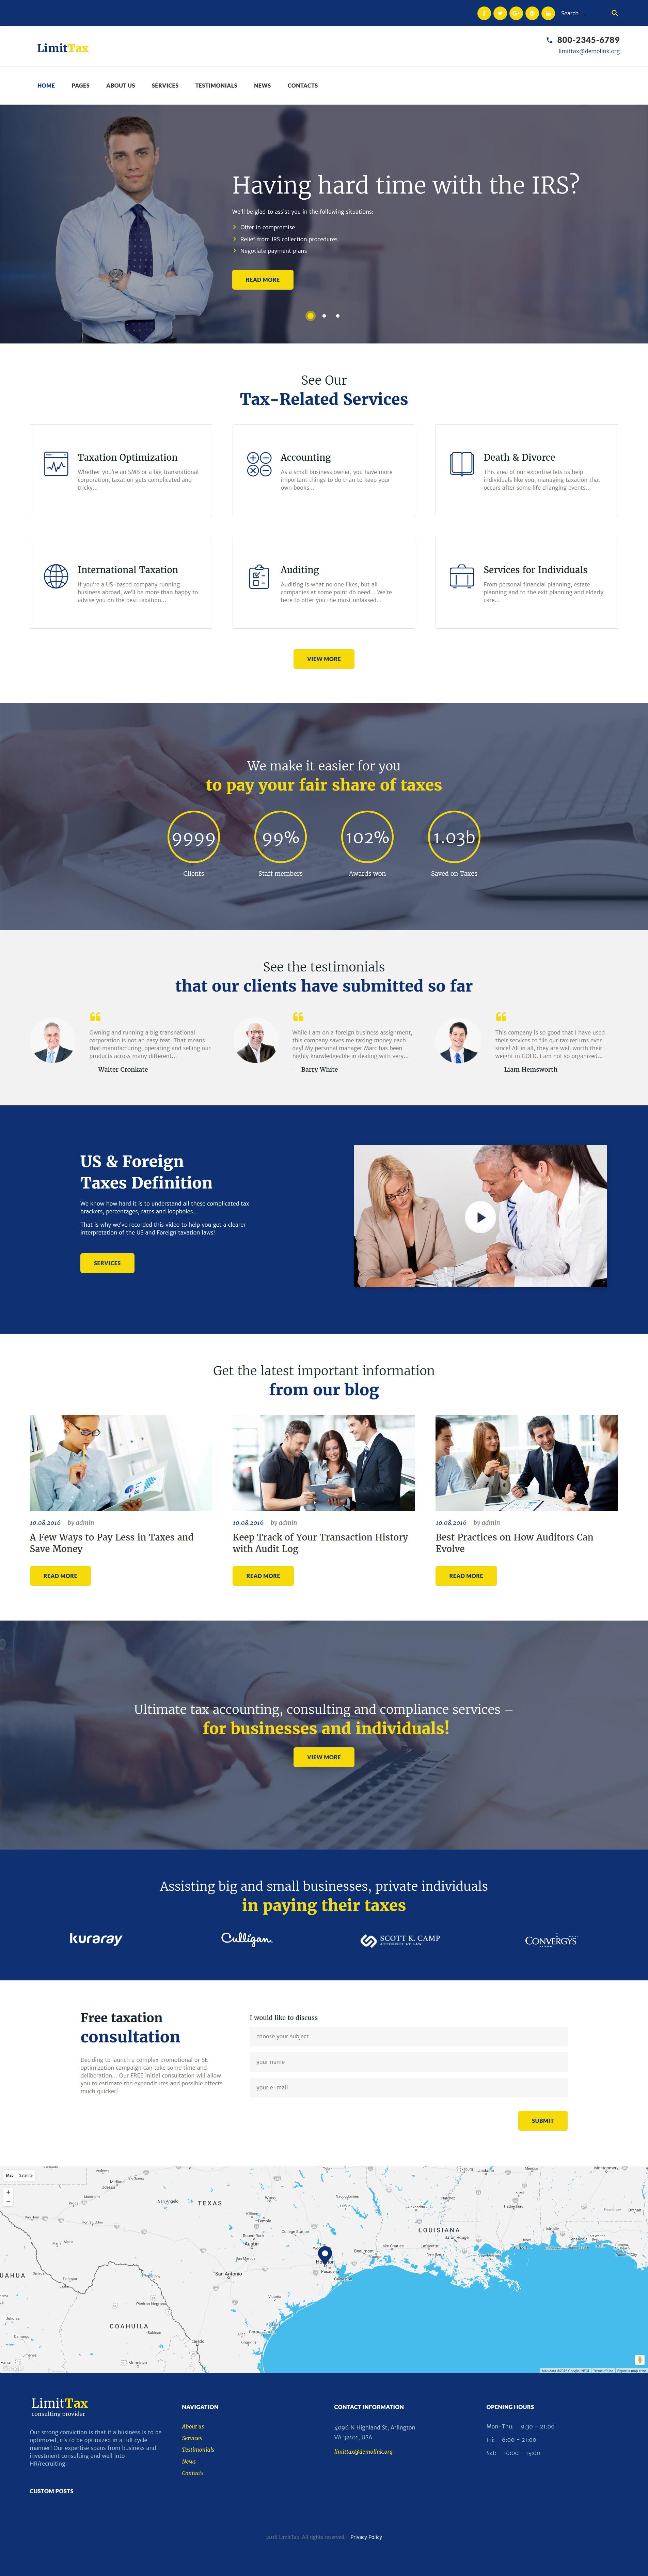 """LimitTax - Auditing and Accounting"" - адаптивний WordPress шаблон №60125"